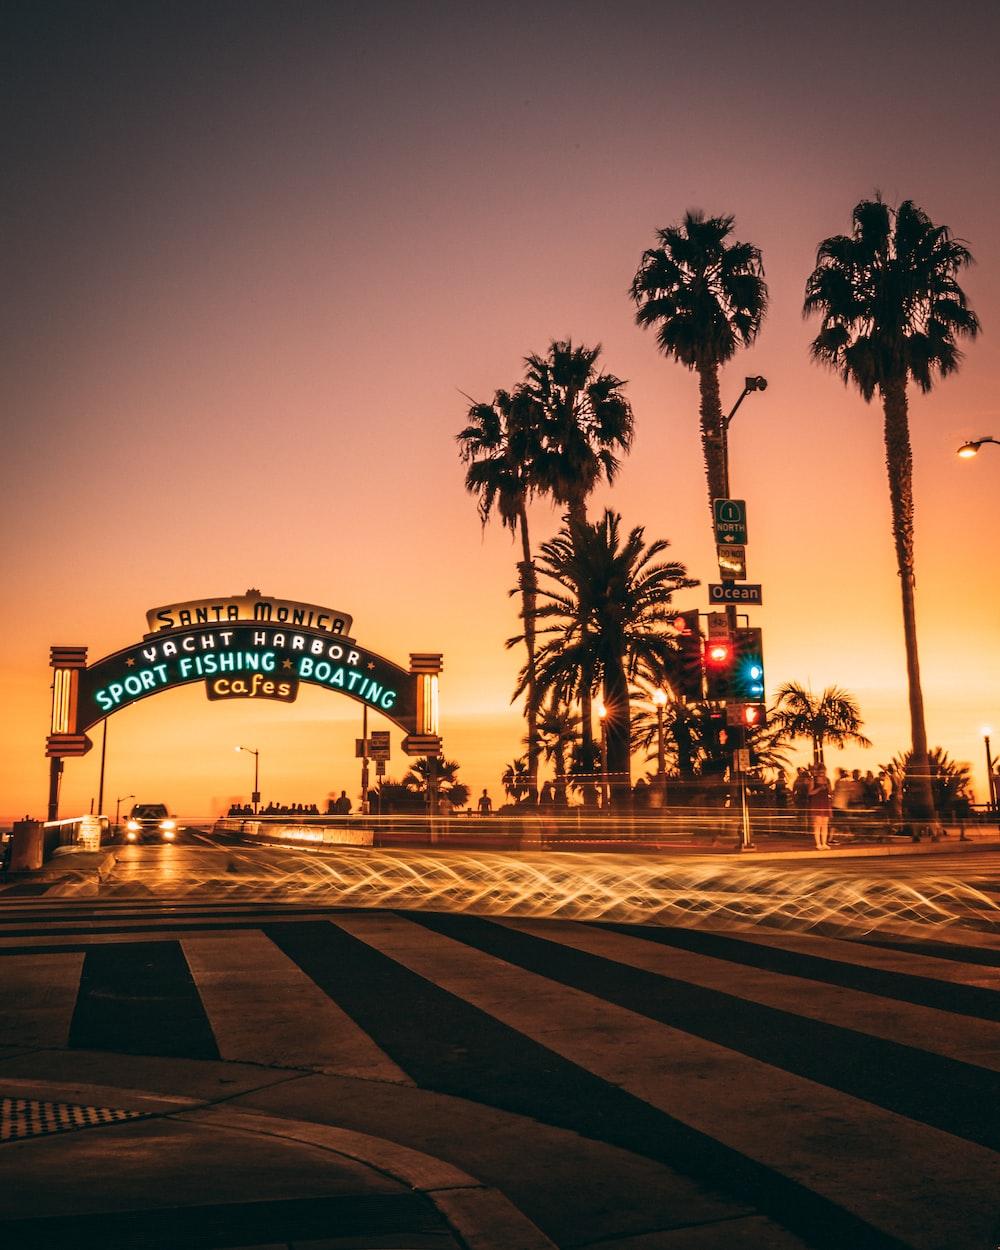 Santa Monica ark in shallow focus photography